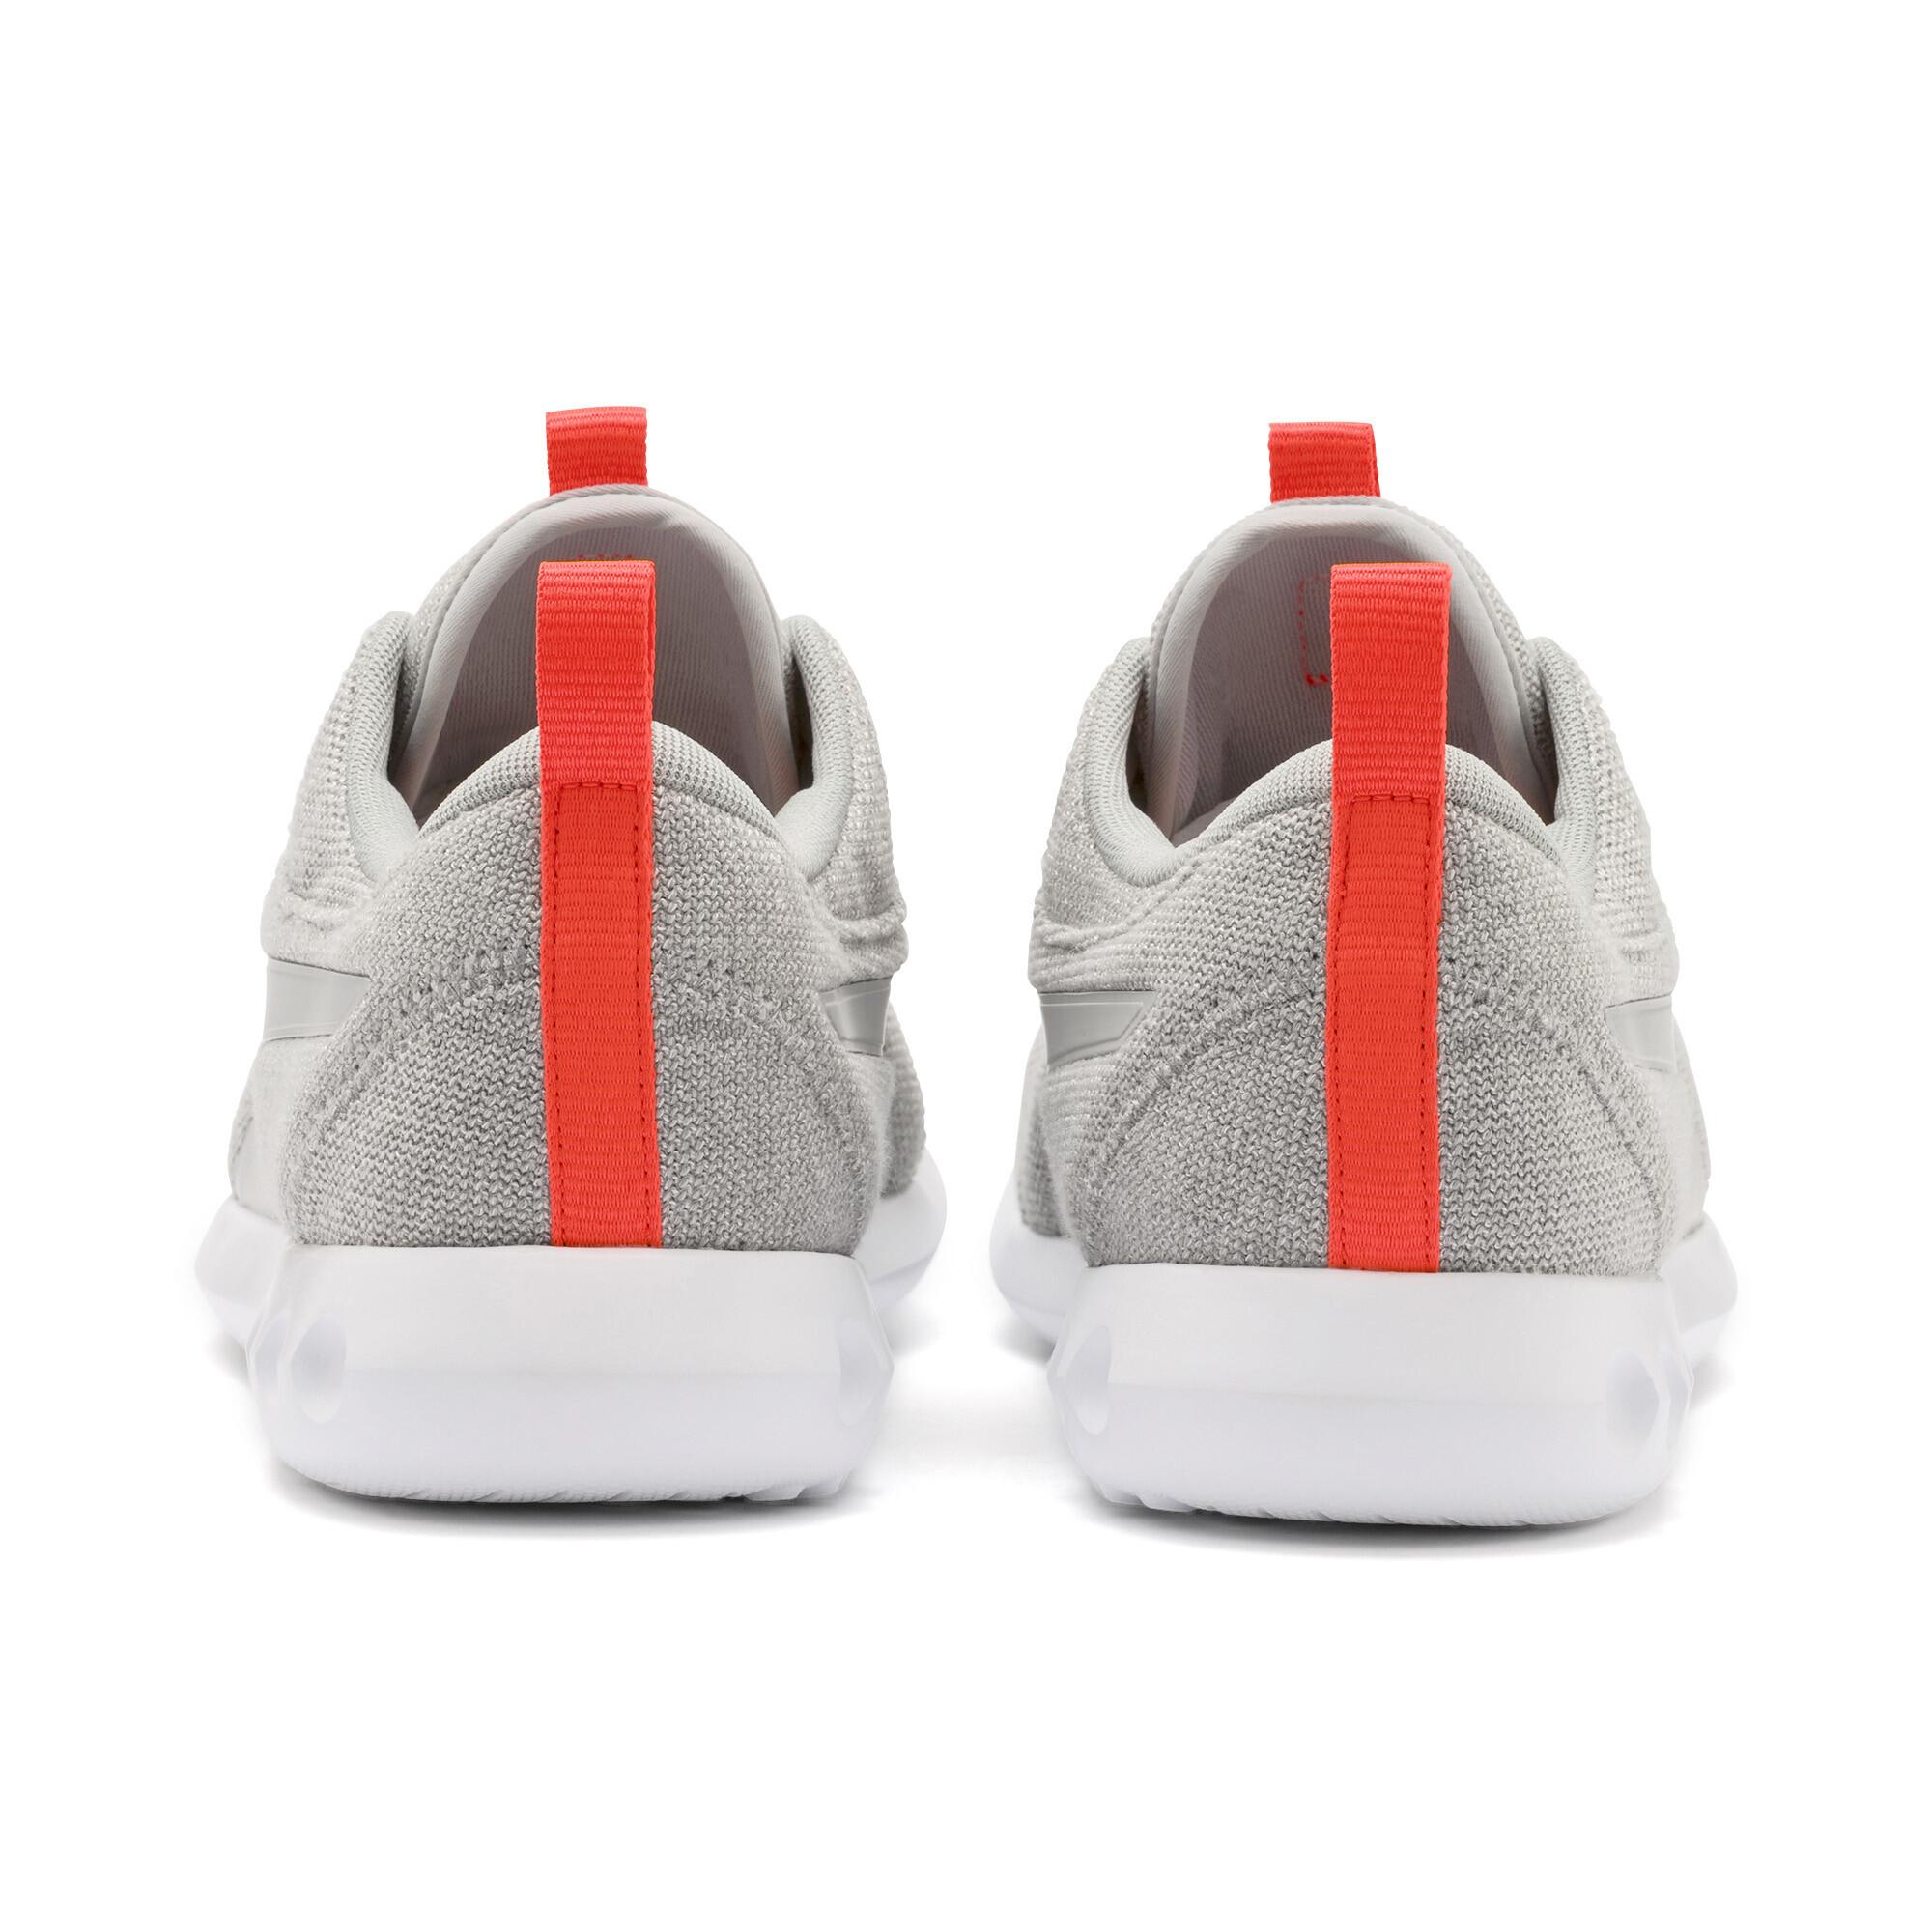 PUMA-Carson-2-Knit-Men-039-s-Training-Shoes-Men-Shoe-Running thumbnail 11